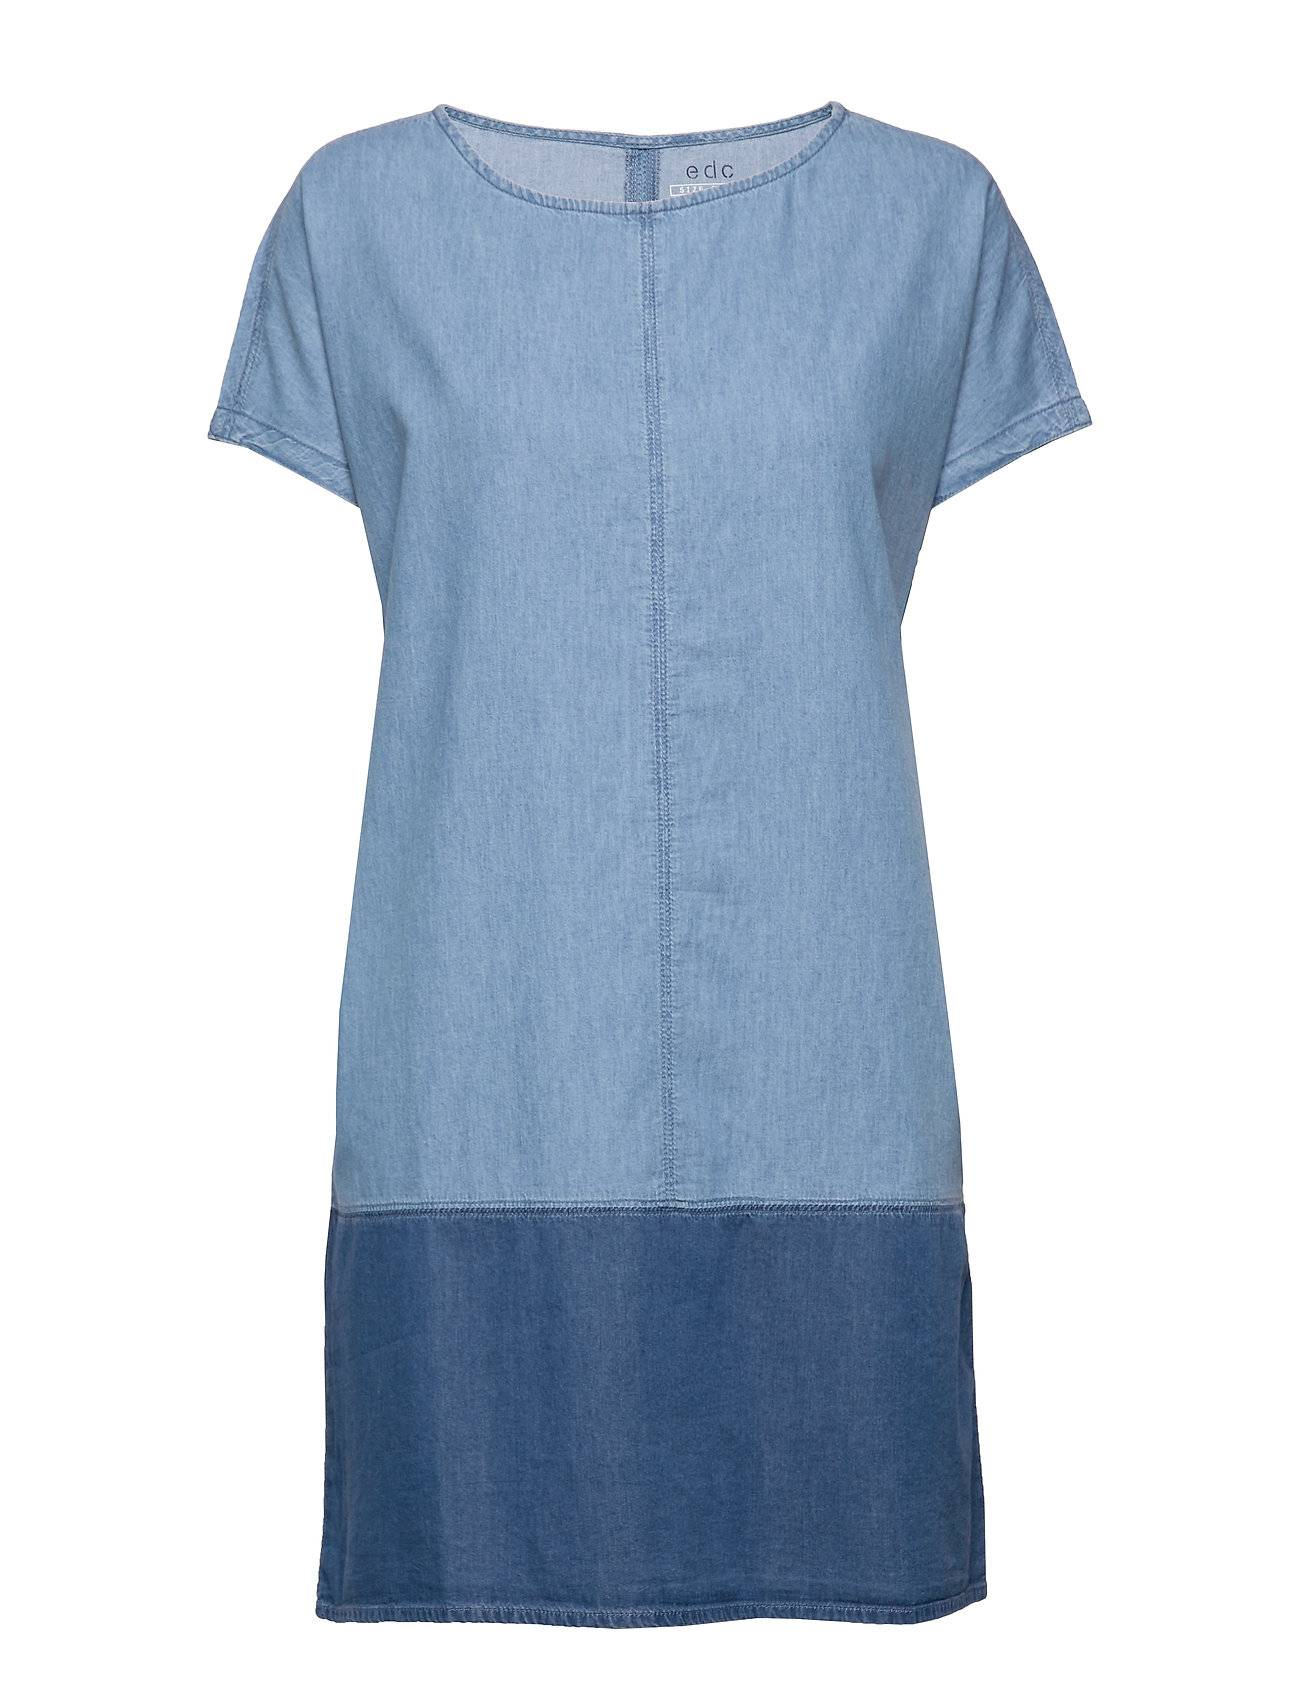 EDC by Esprit Dresses Denim Lyhyt Mekko Sininen EDC By Esprit